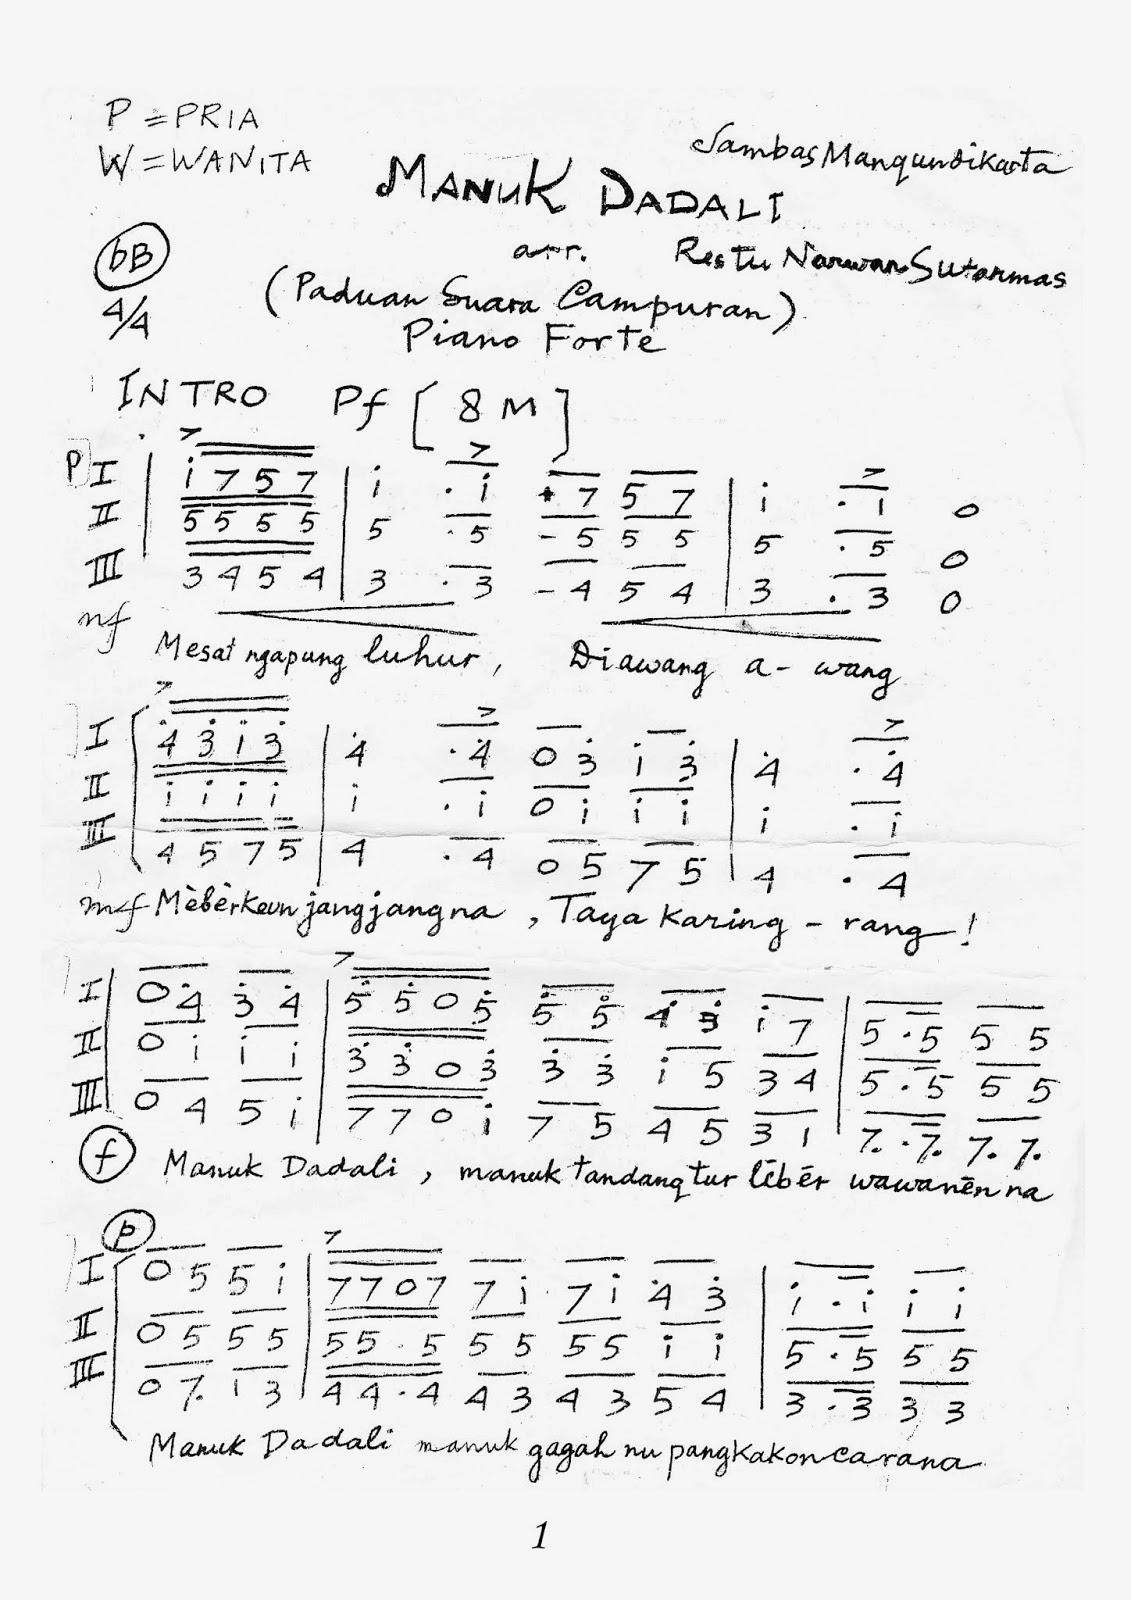 Not Pianika Manuk Dadali : pianika, manuk, dadali, Archives, Diyefira0f